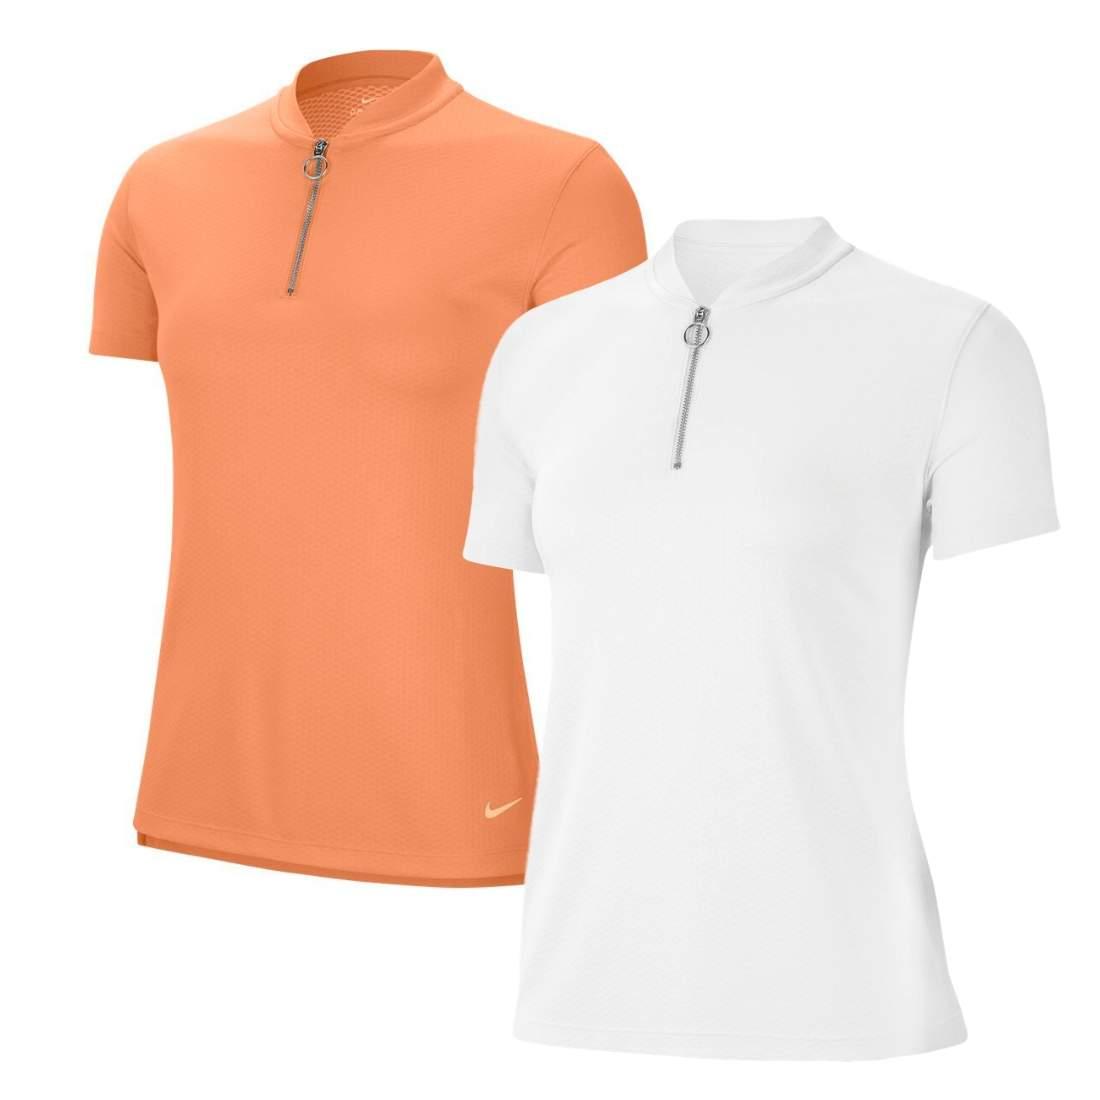 Nike Women's 2020 Dri-Fit Fairway Polo